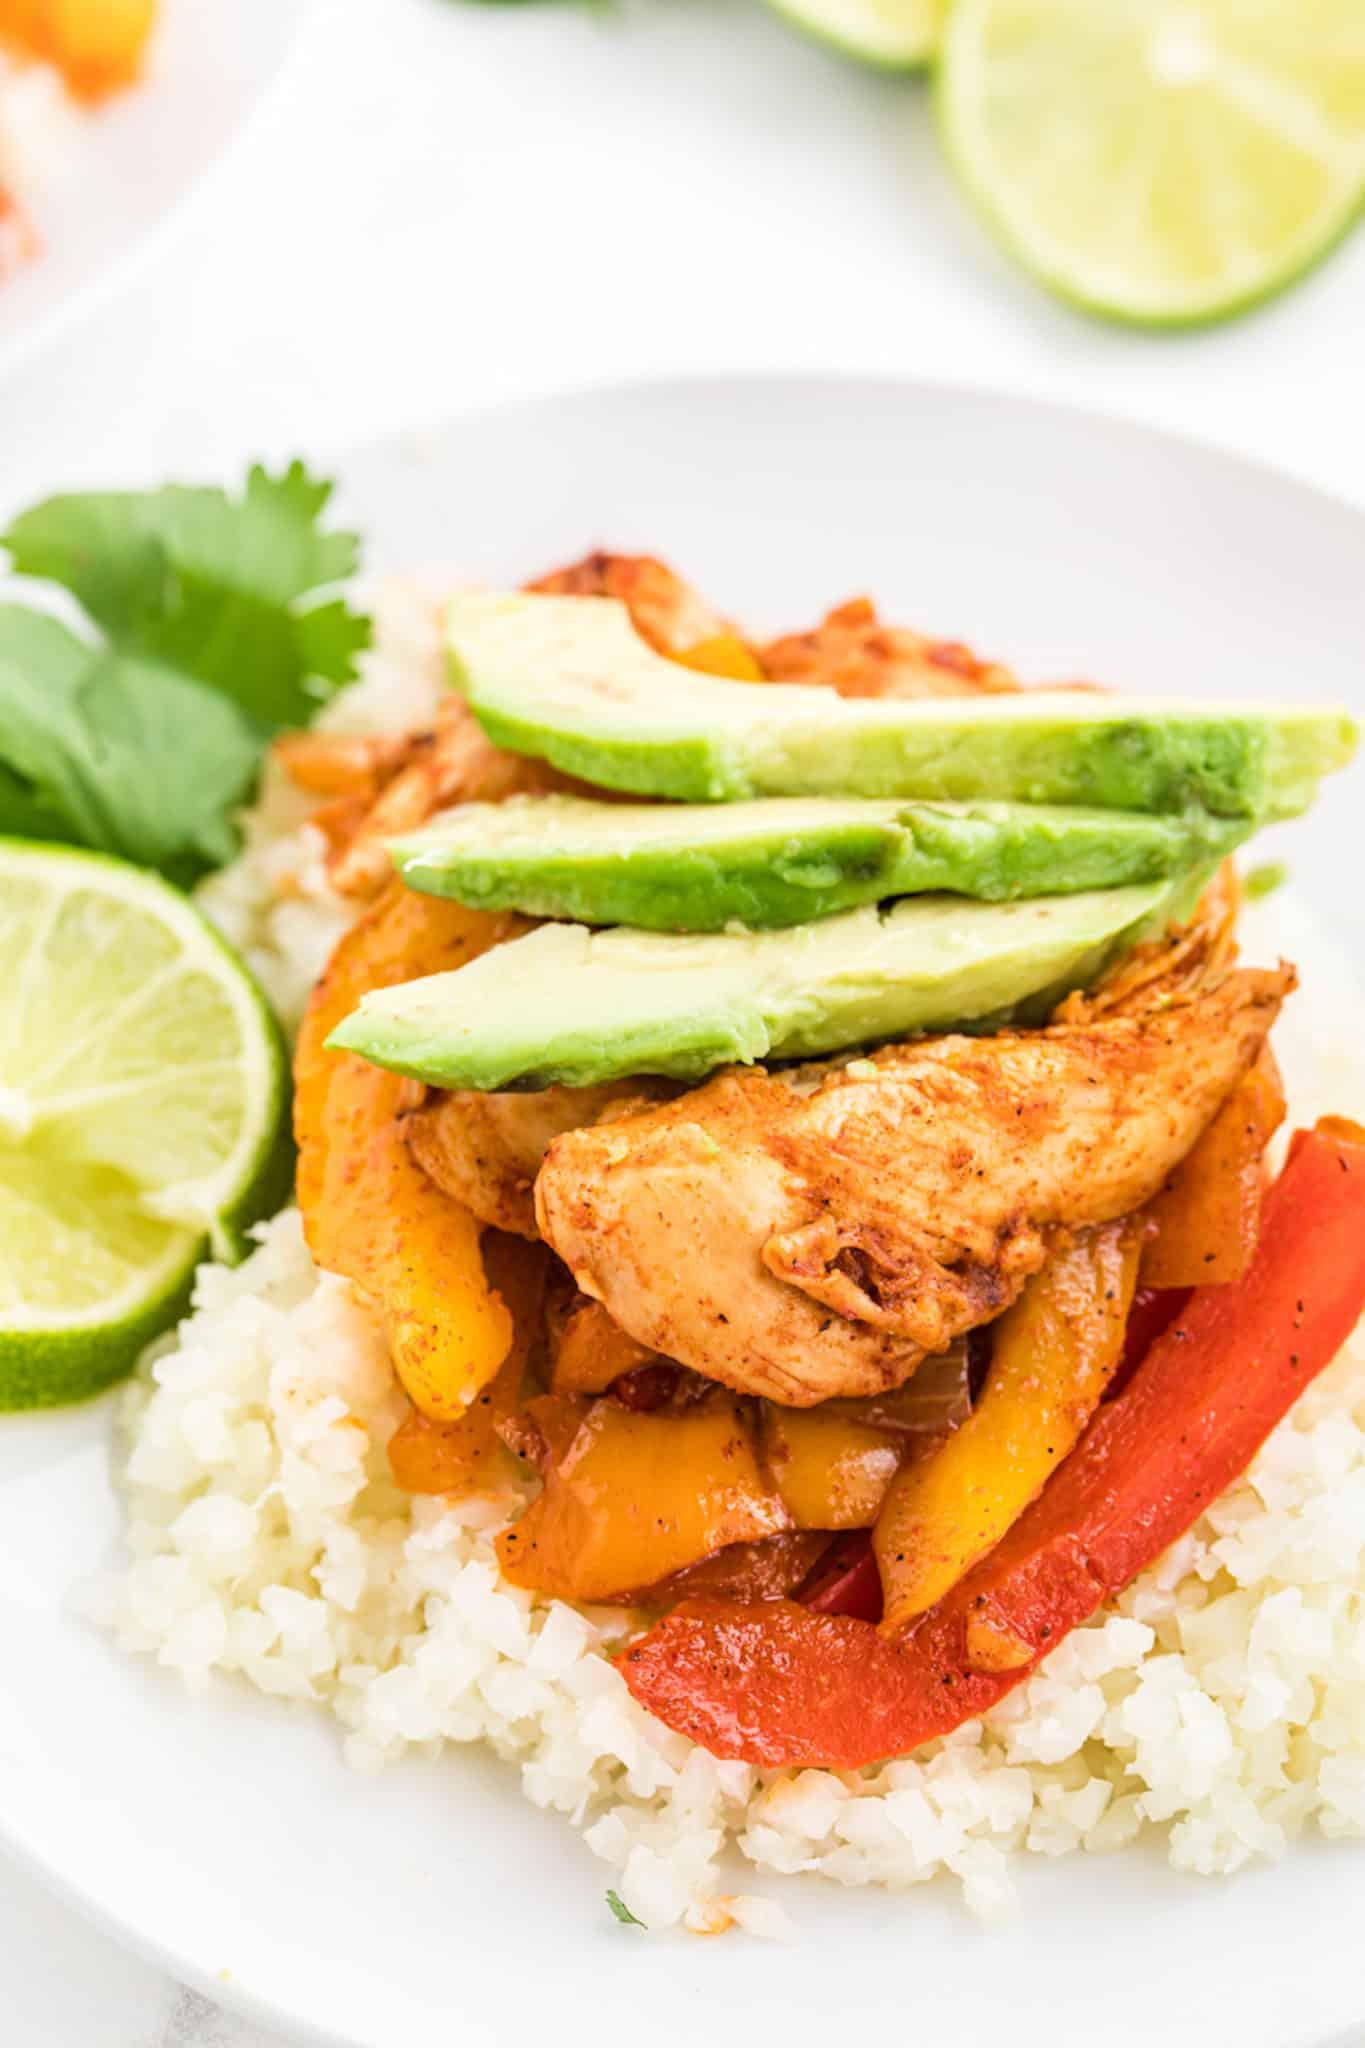 Chicken fajitas over cauliflower rice with avocado